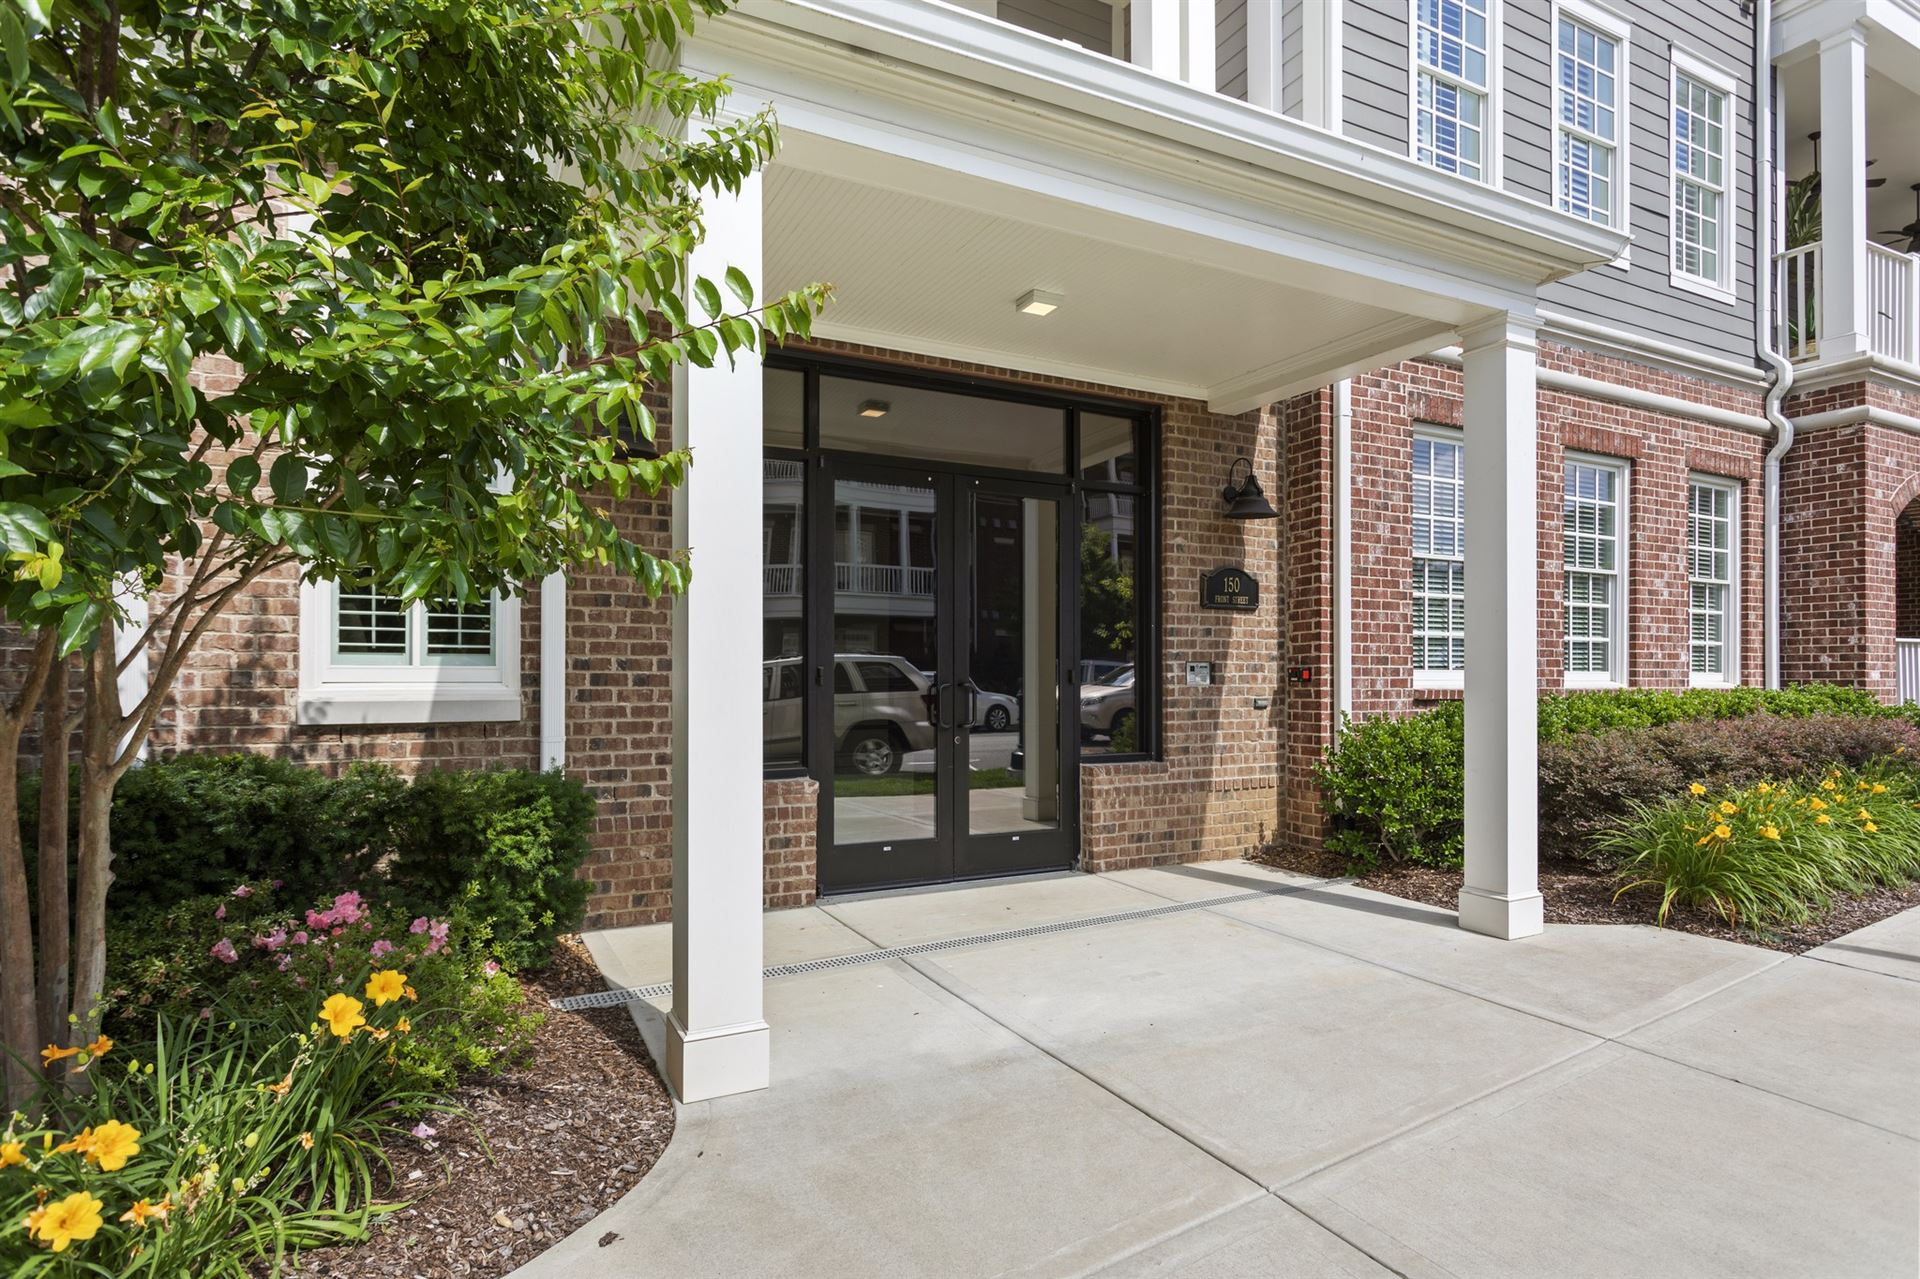 Photo of 150 Front Street #11, Franklin, TN 37064 (MLS # 2262880)